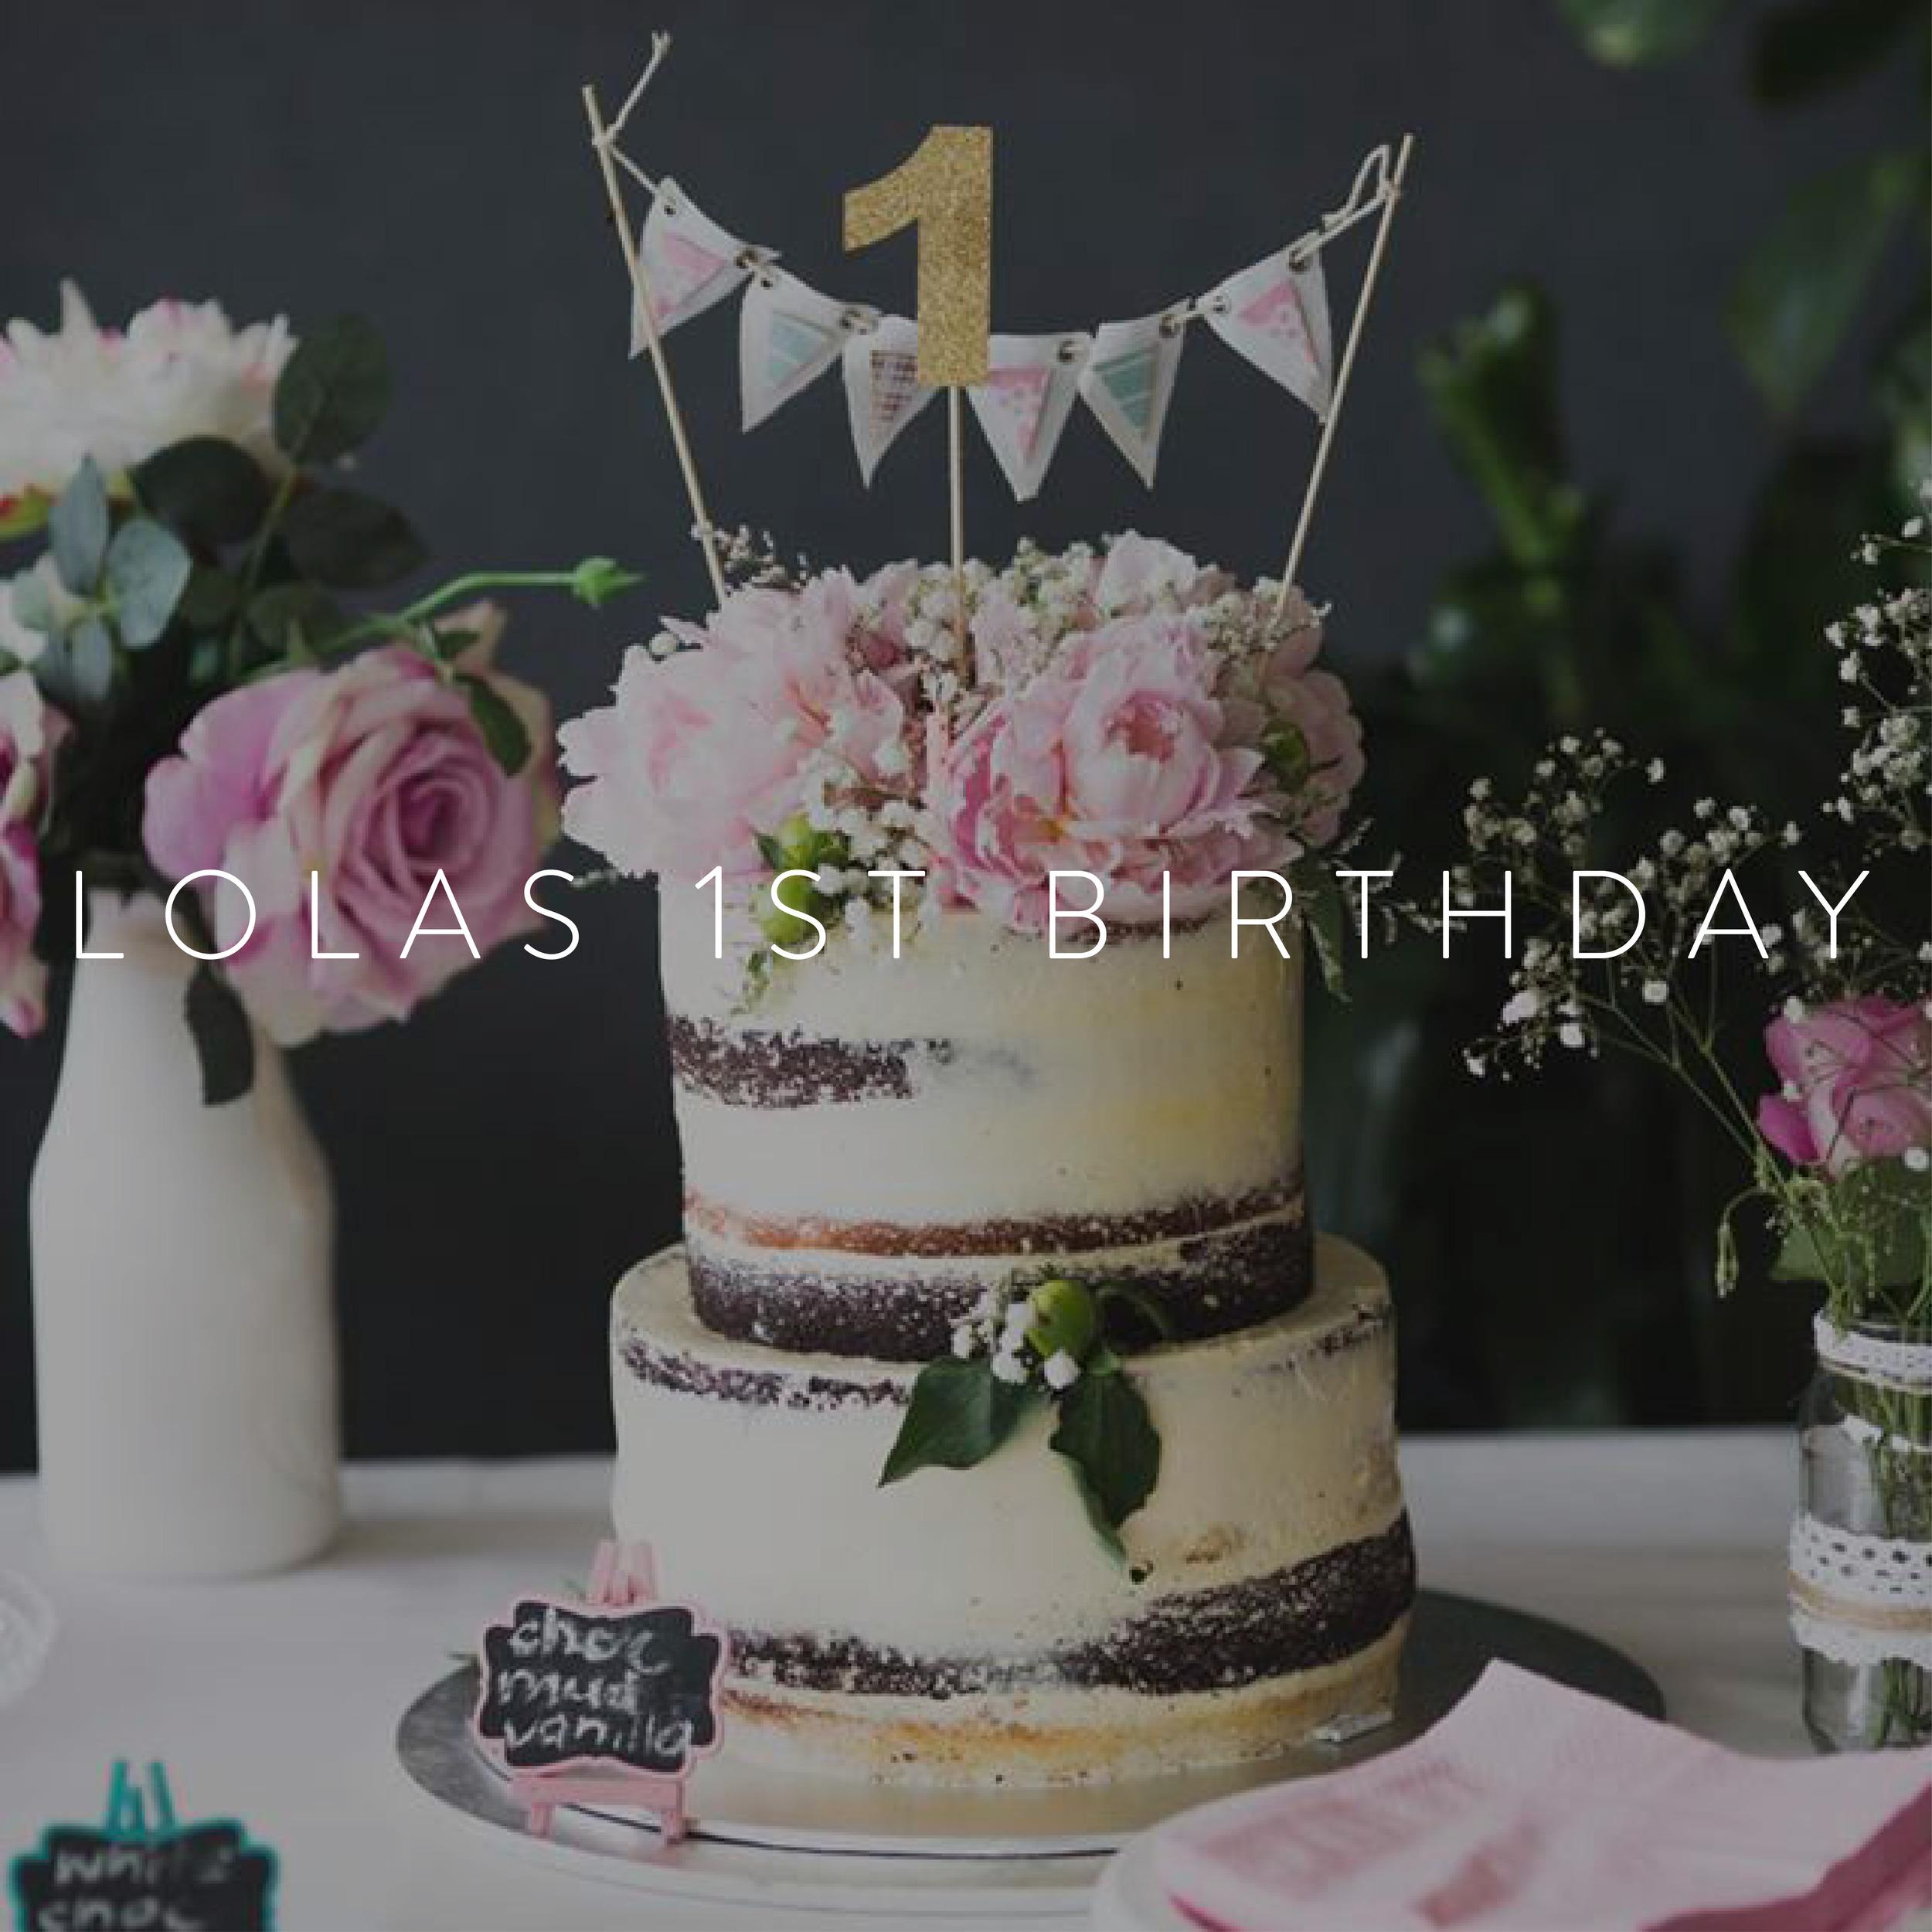 LOLAS FIRST BIRTHDAY